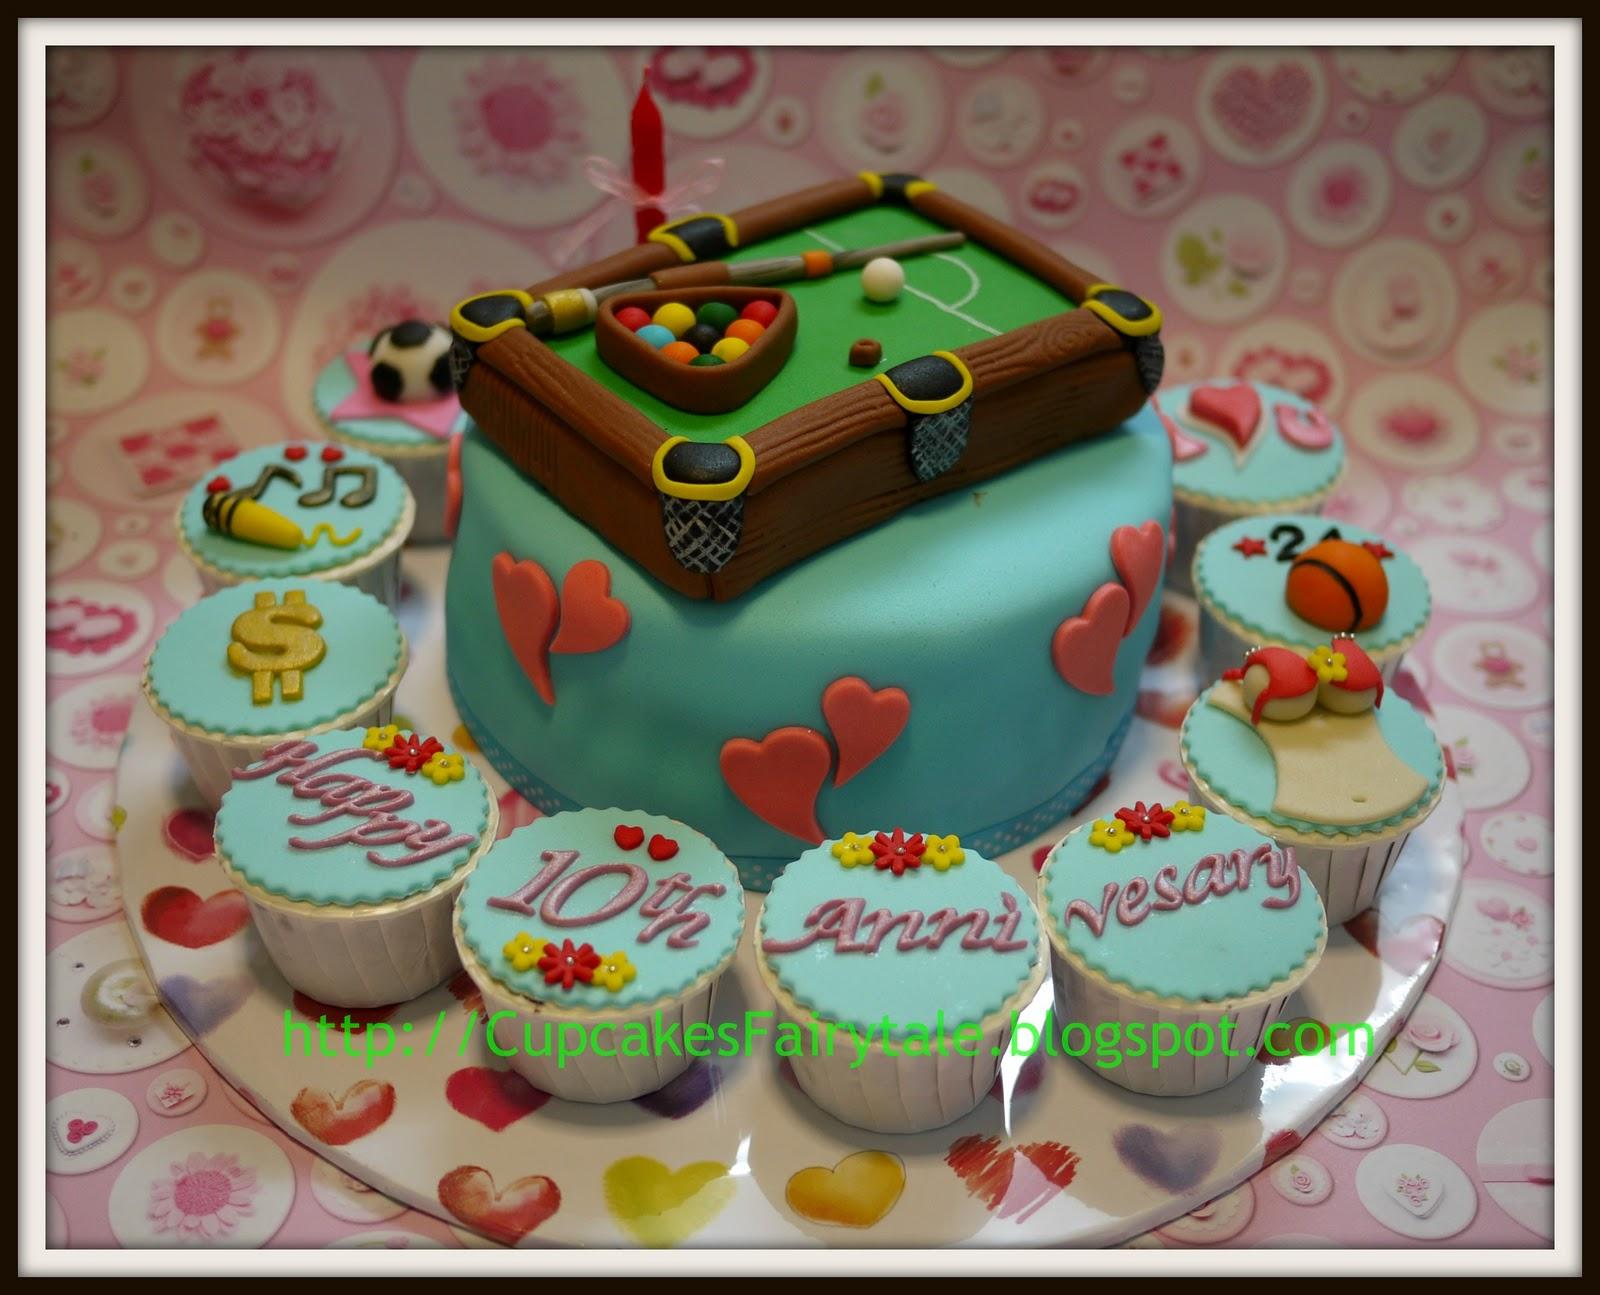 Cupcakes Fairytale LEE CHU S 10TH WEDDING ANNIVERSARY